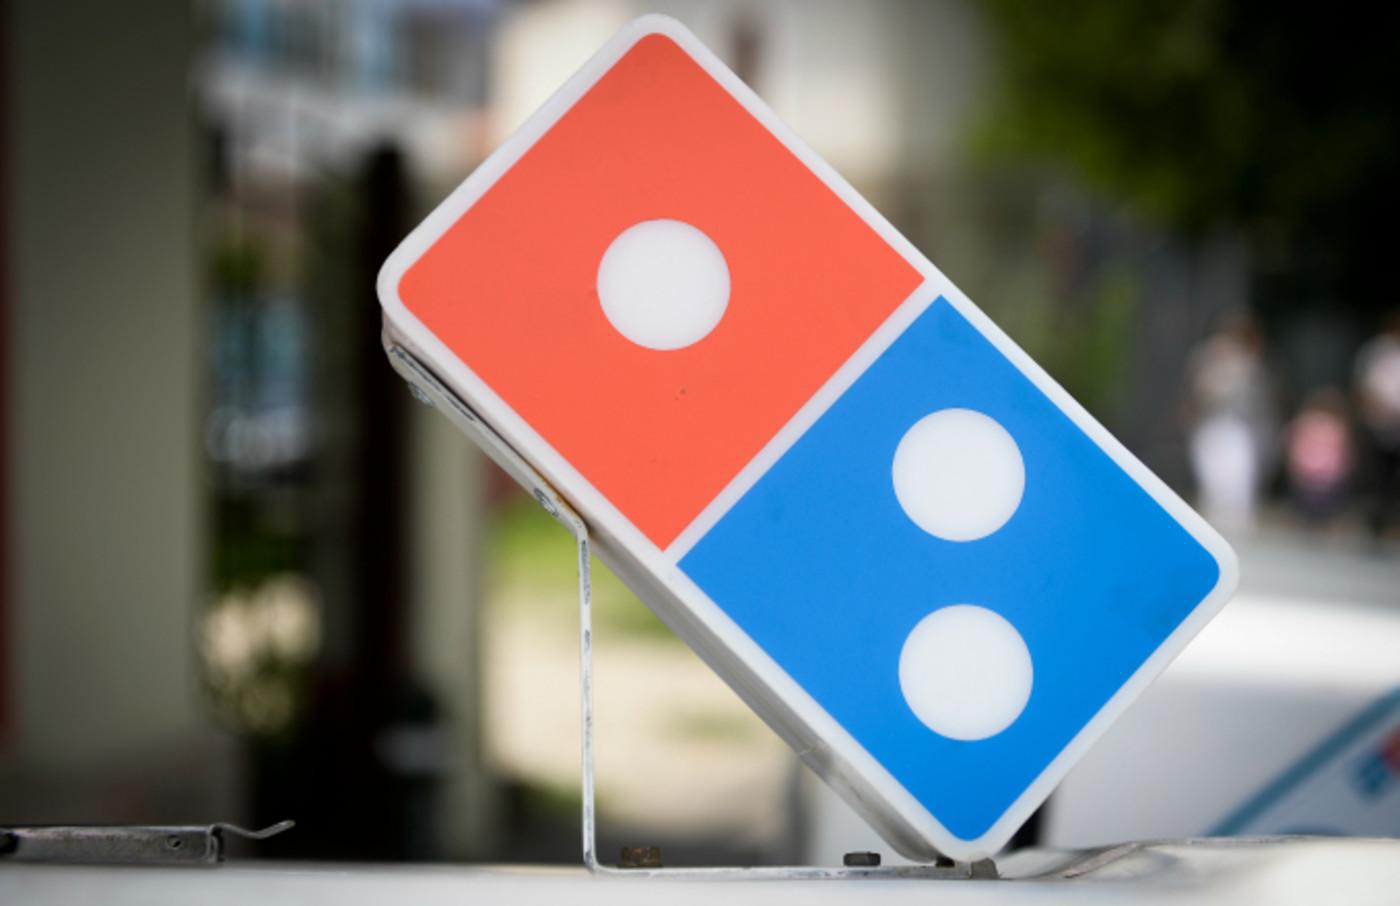 The Dominos Pizza logo